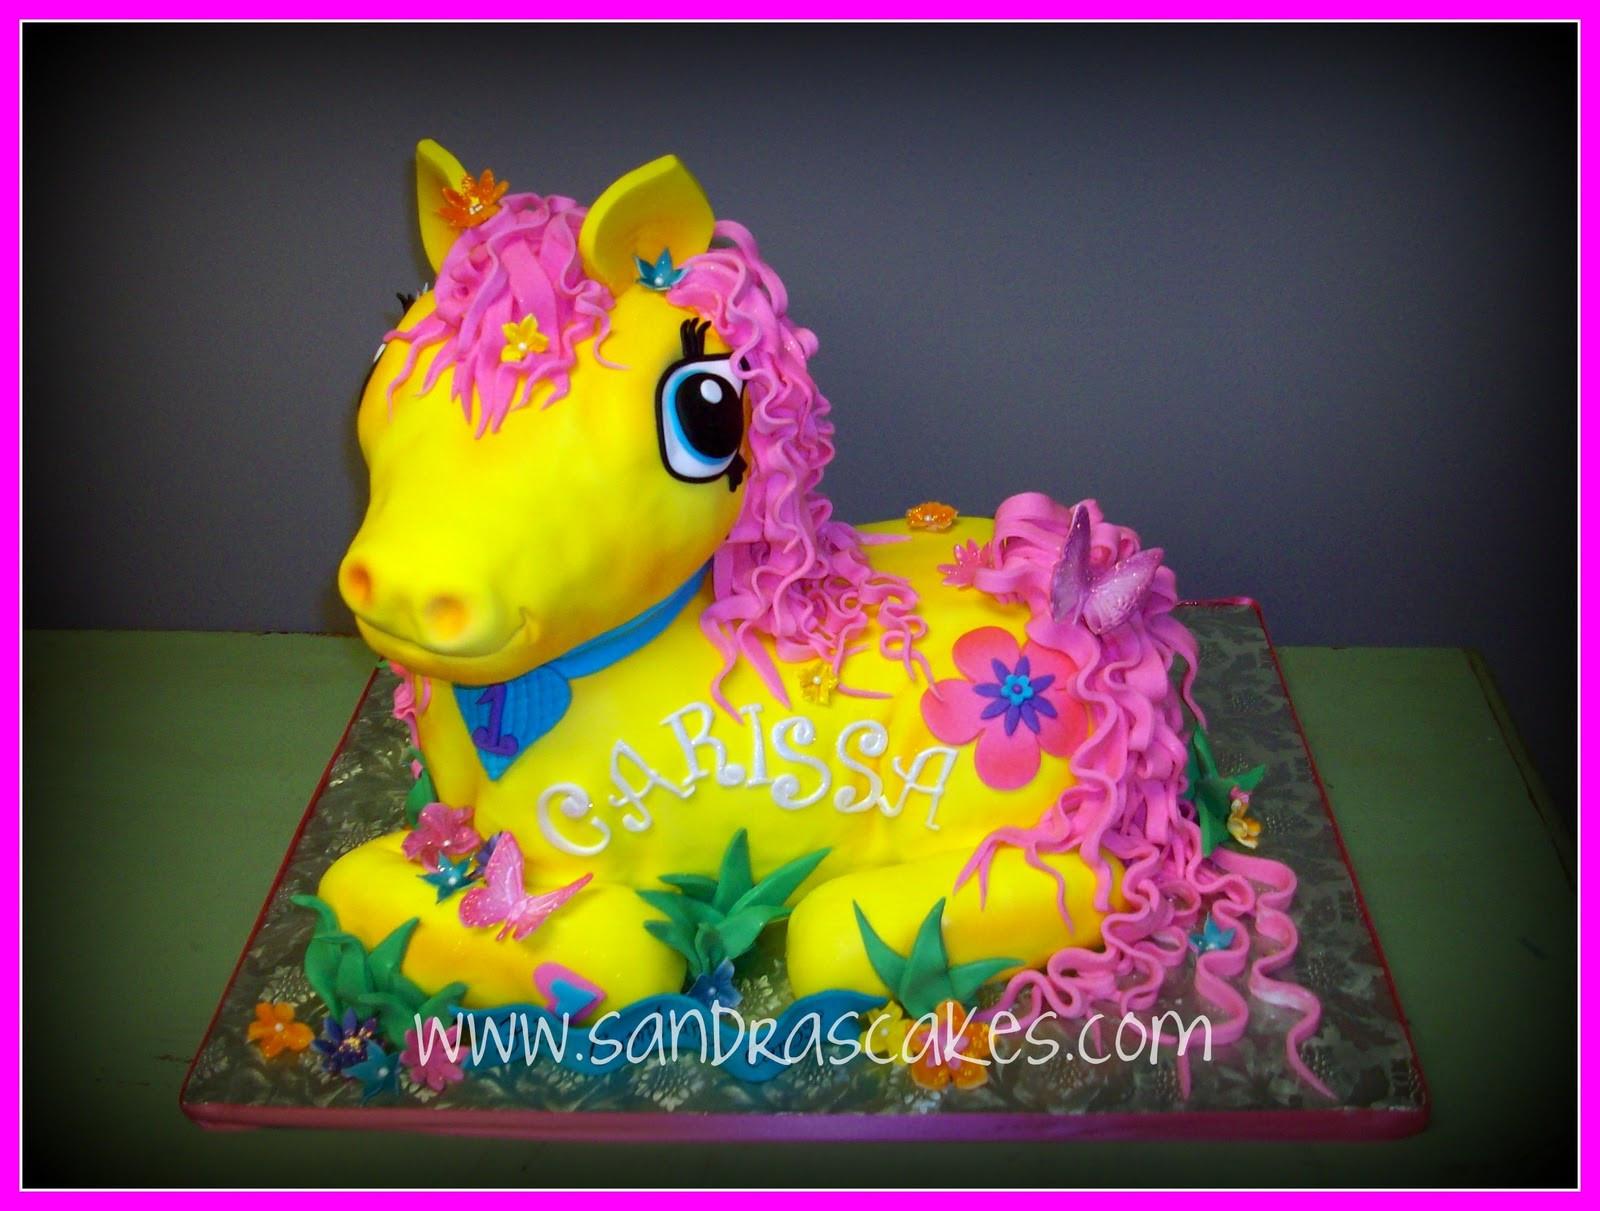 Best ideas about My Little Pony Birthday Cake . Save or Pin My Little Pony Birthday Cake Now.